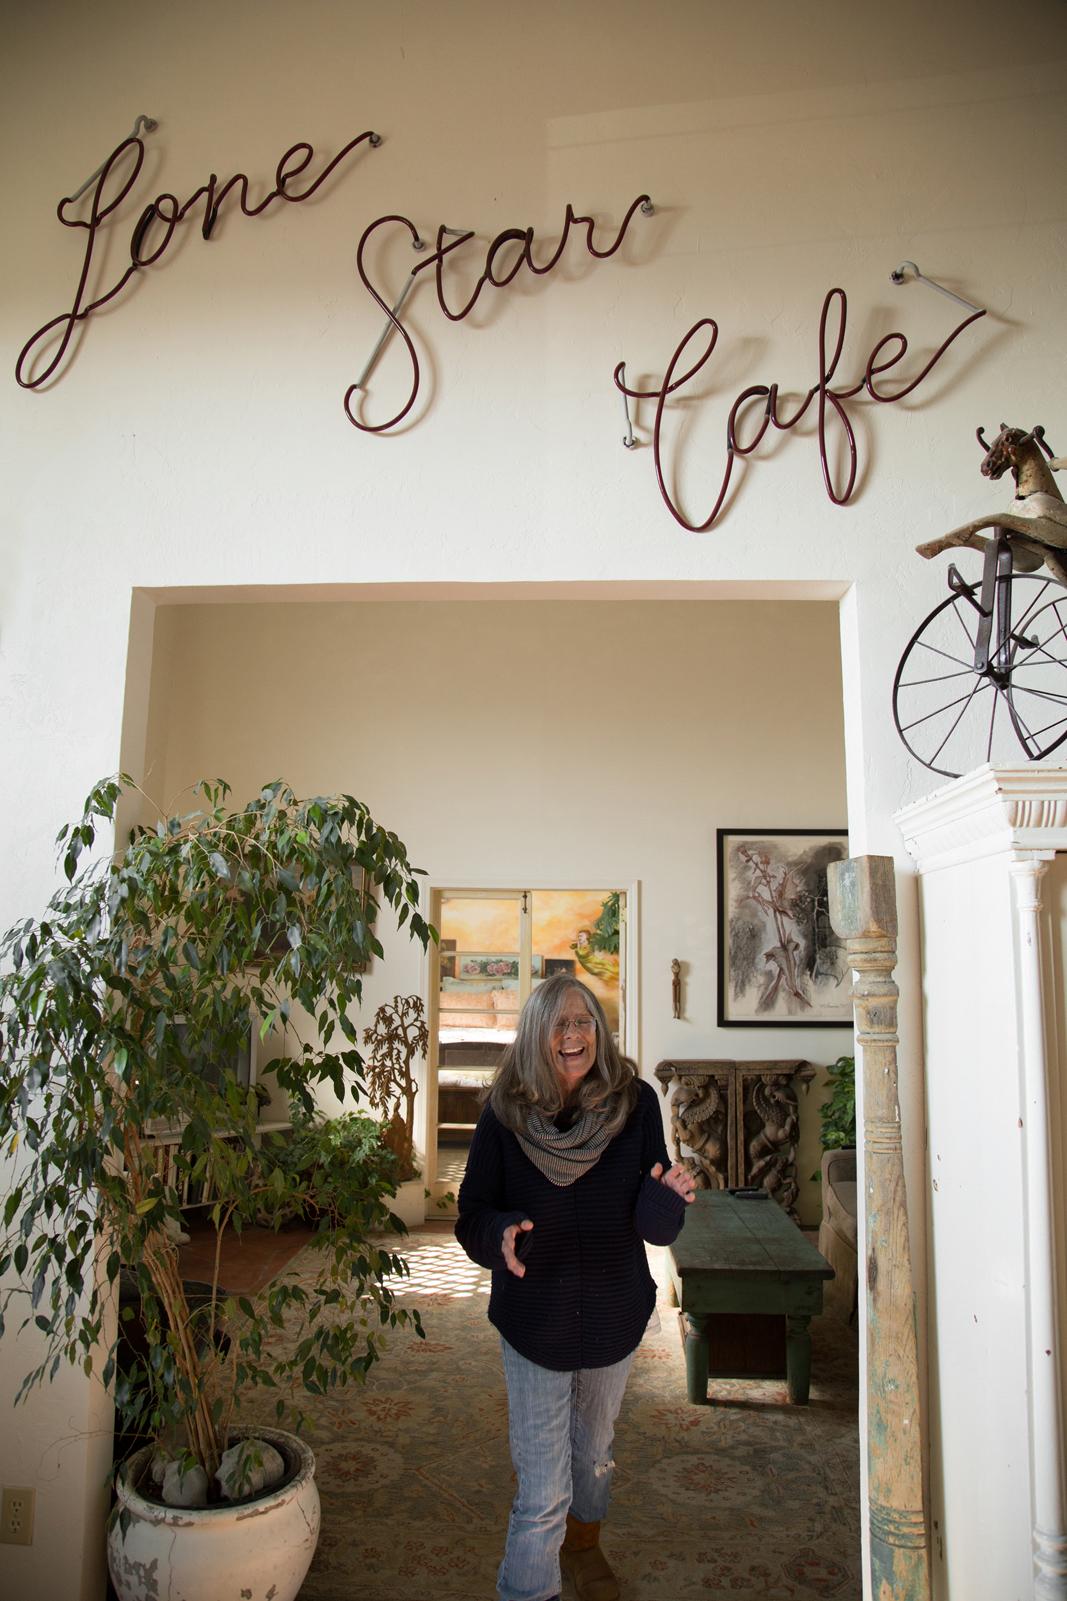 Lone Star Cafe I